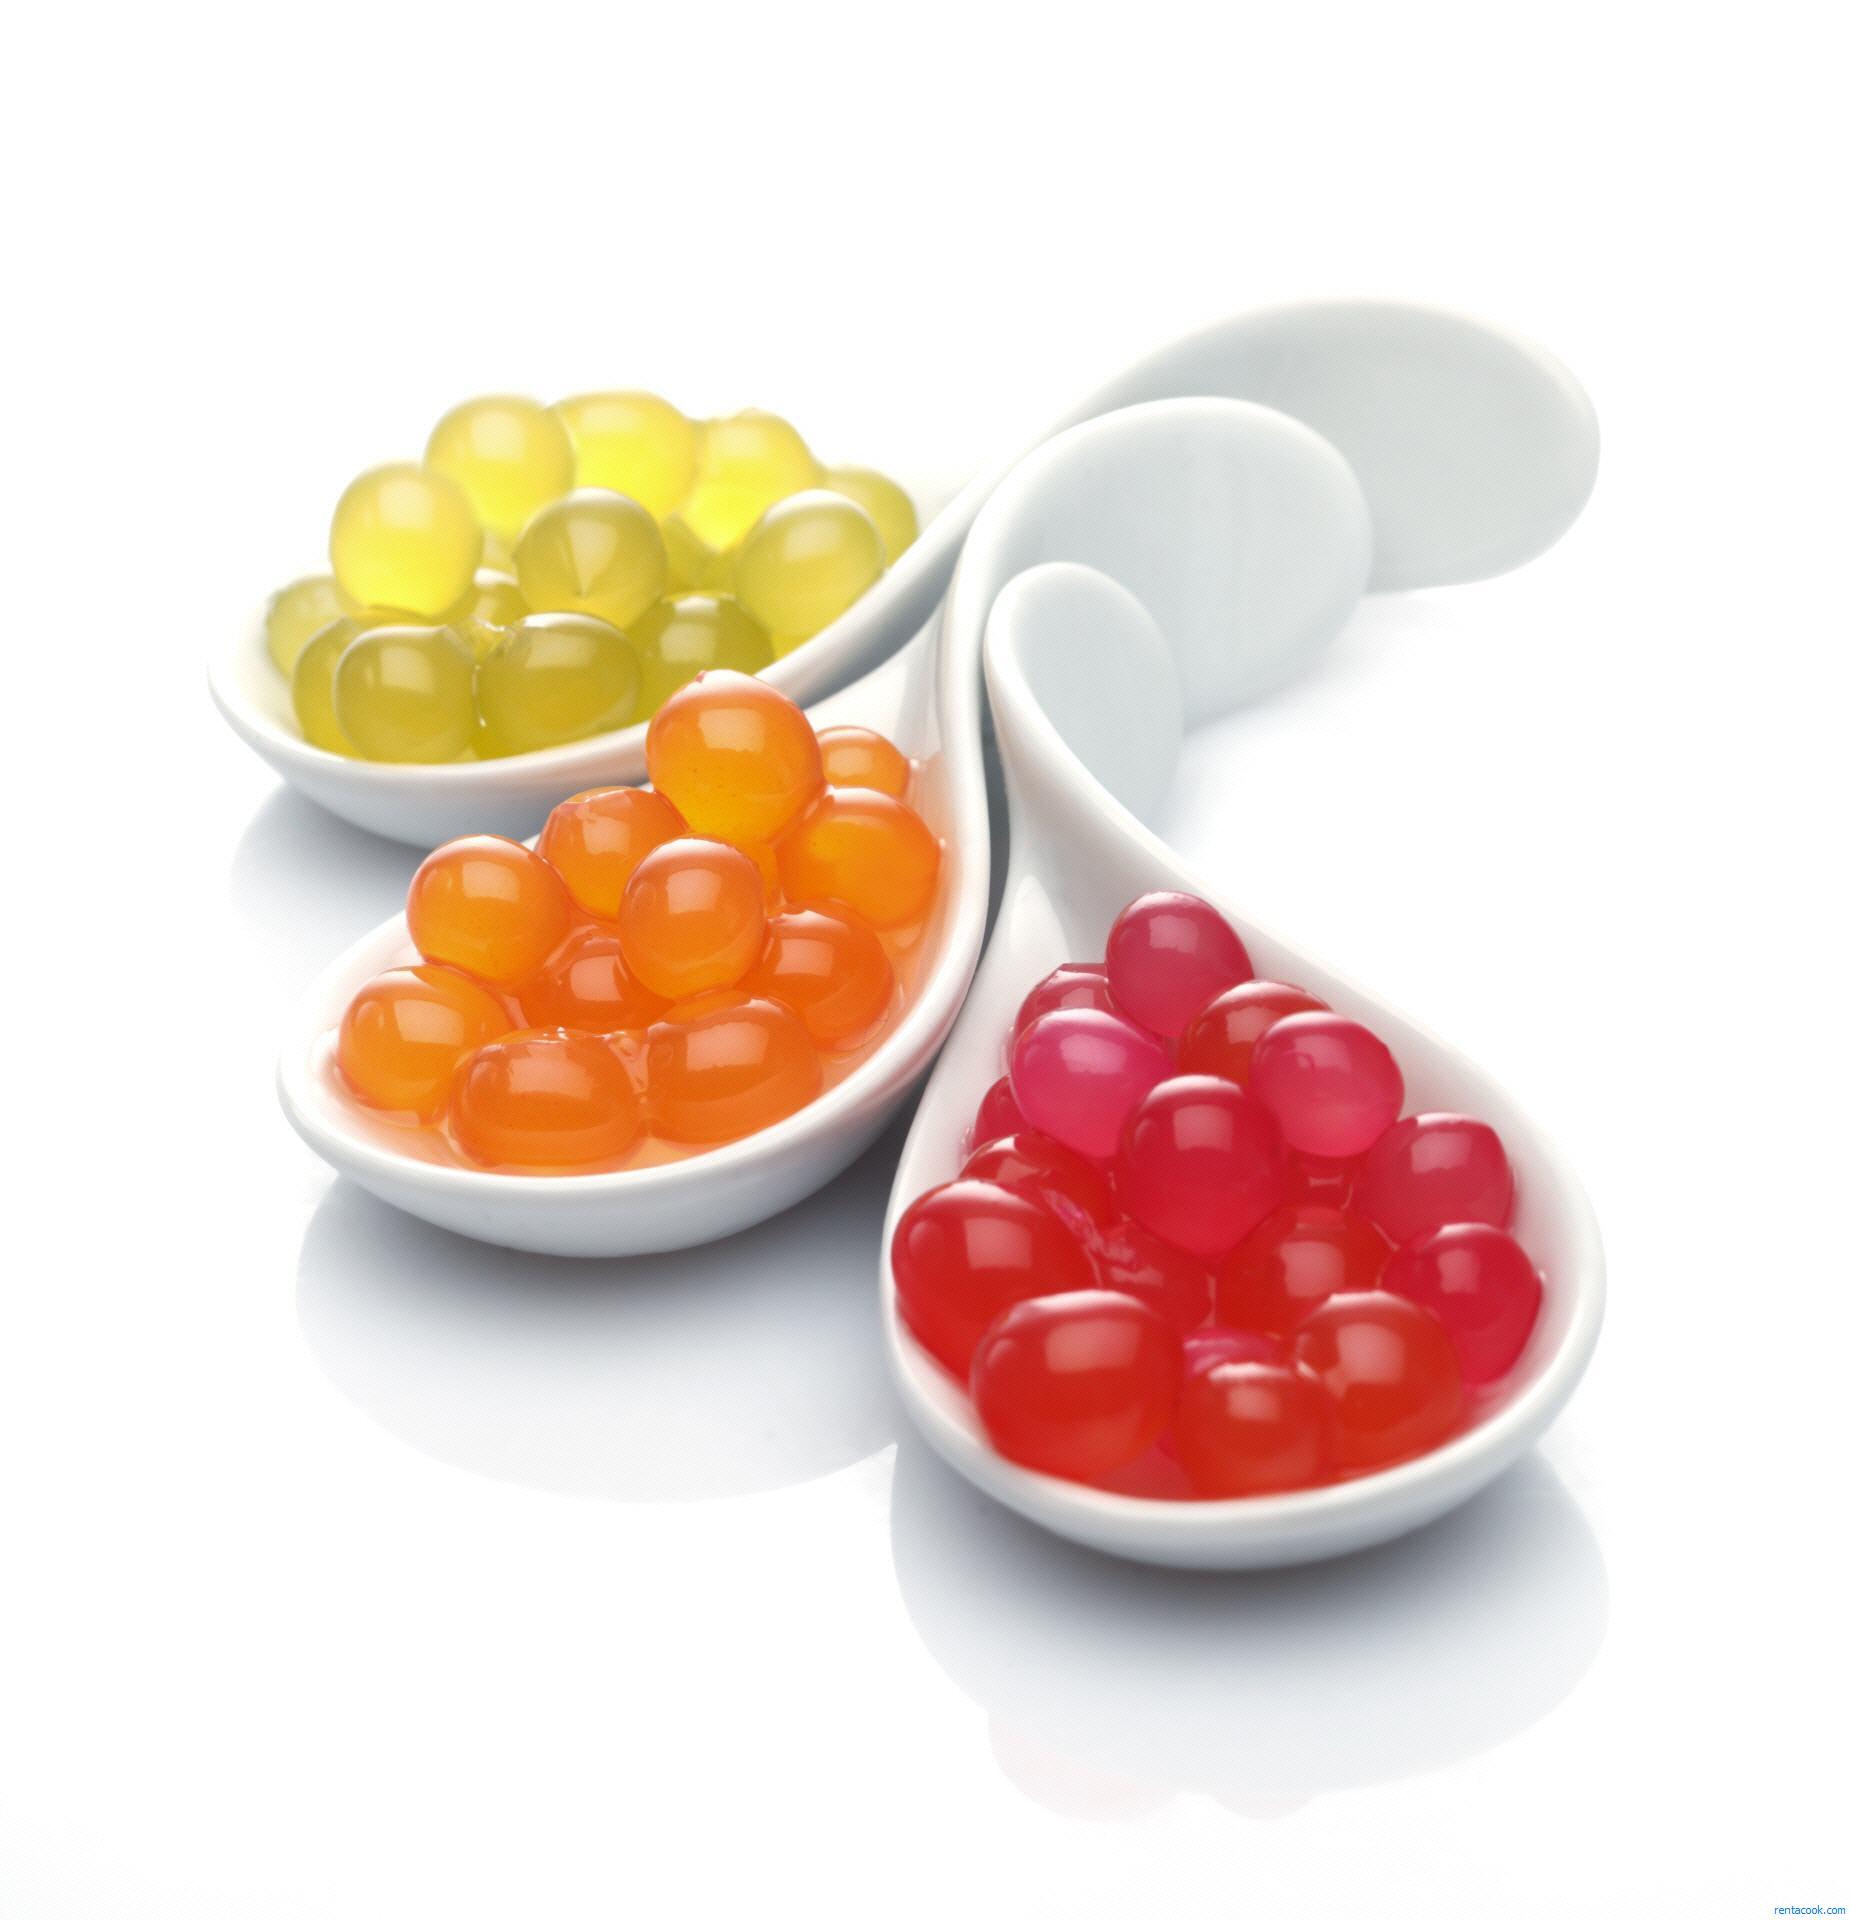 Emejing Molekulare Küche Starterset Ideas - Rellik.us - rellik.us